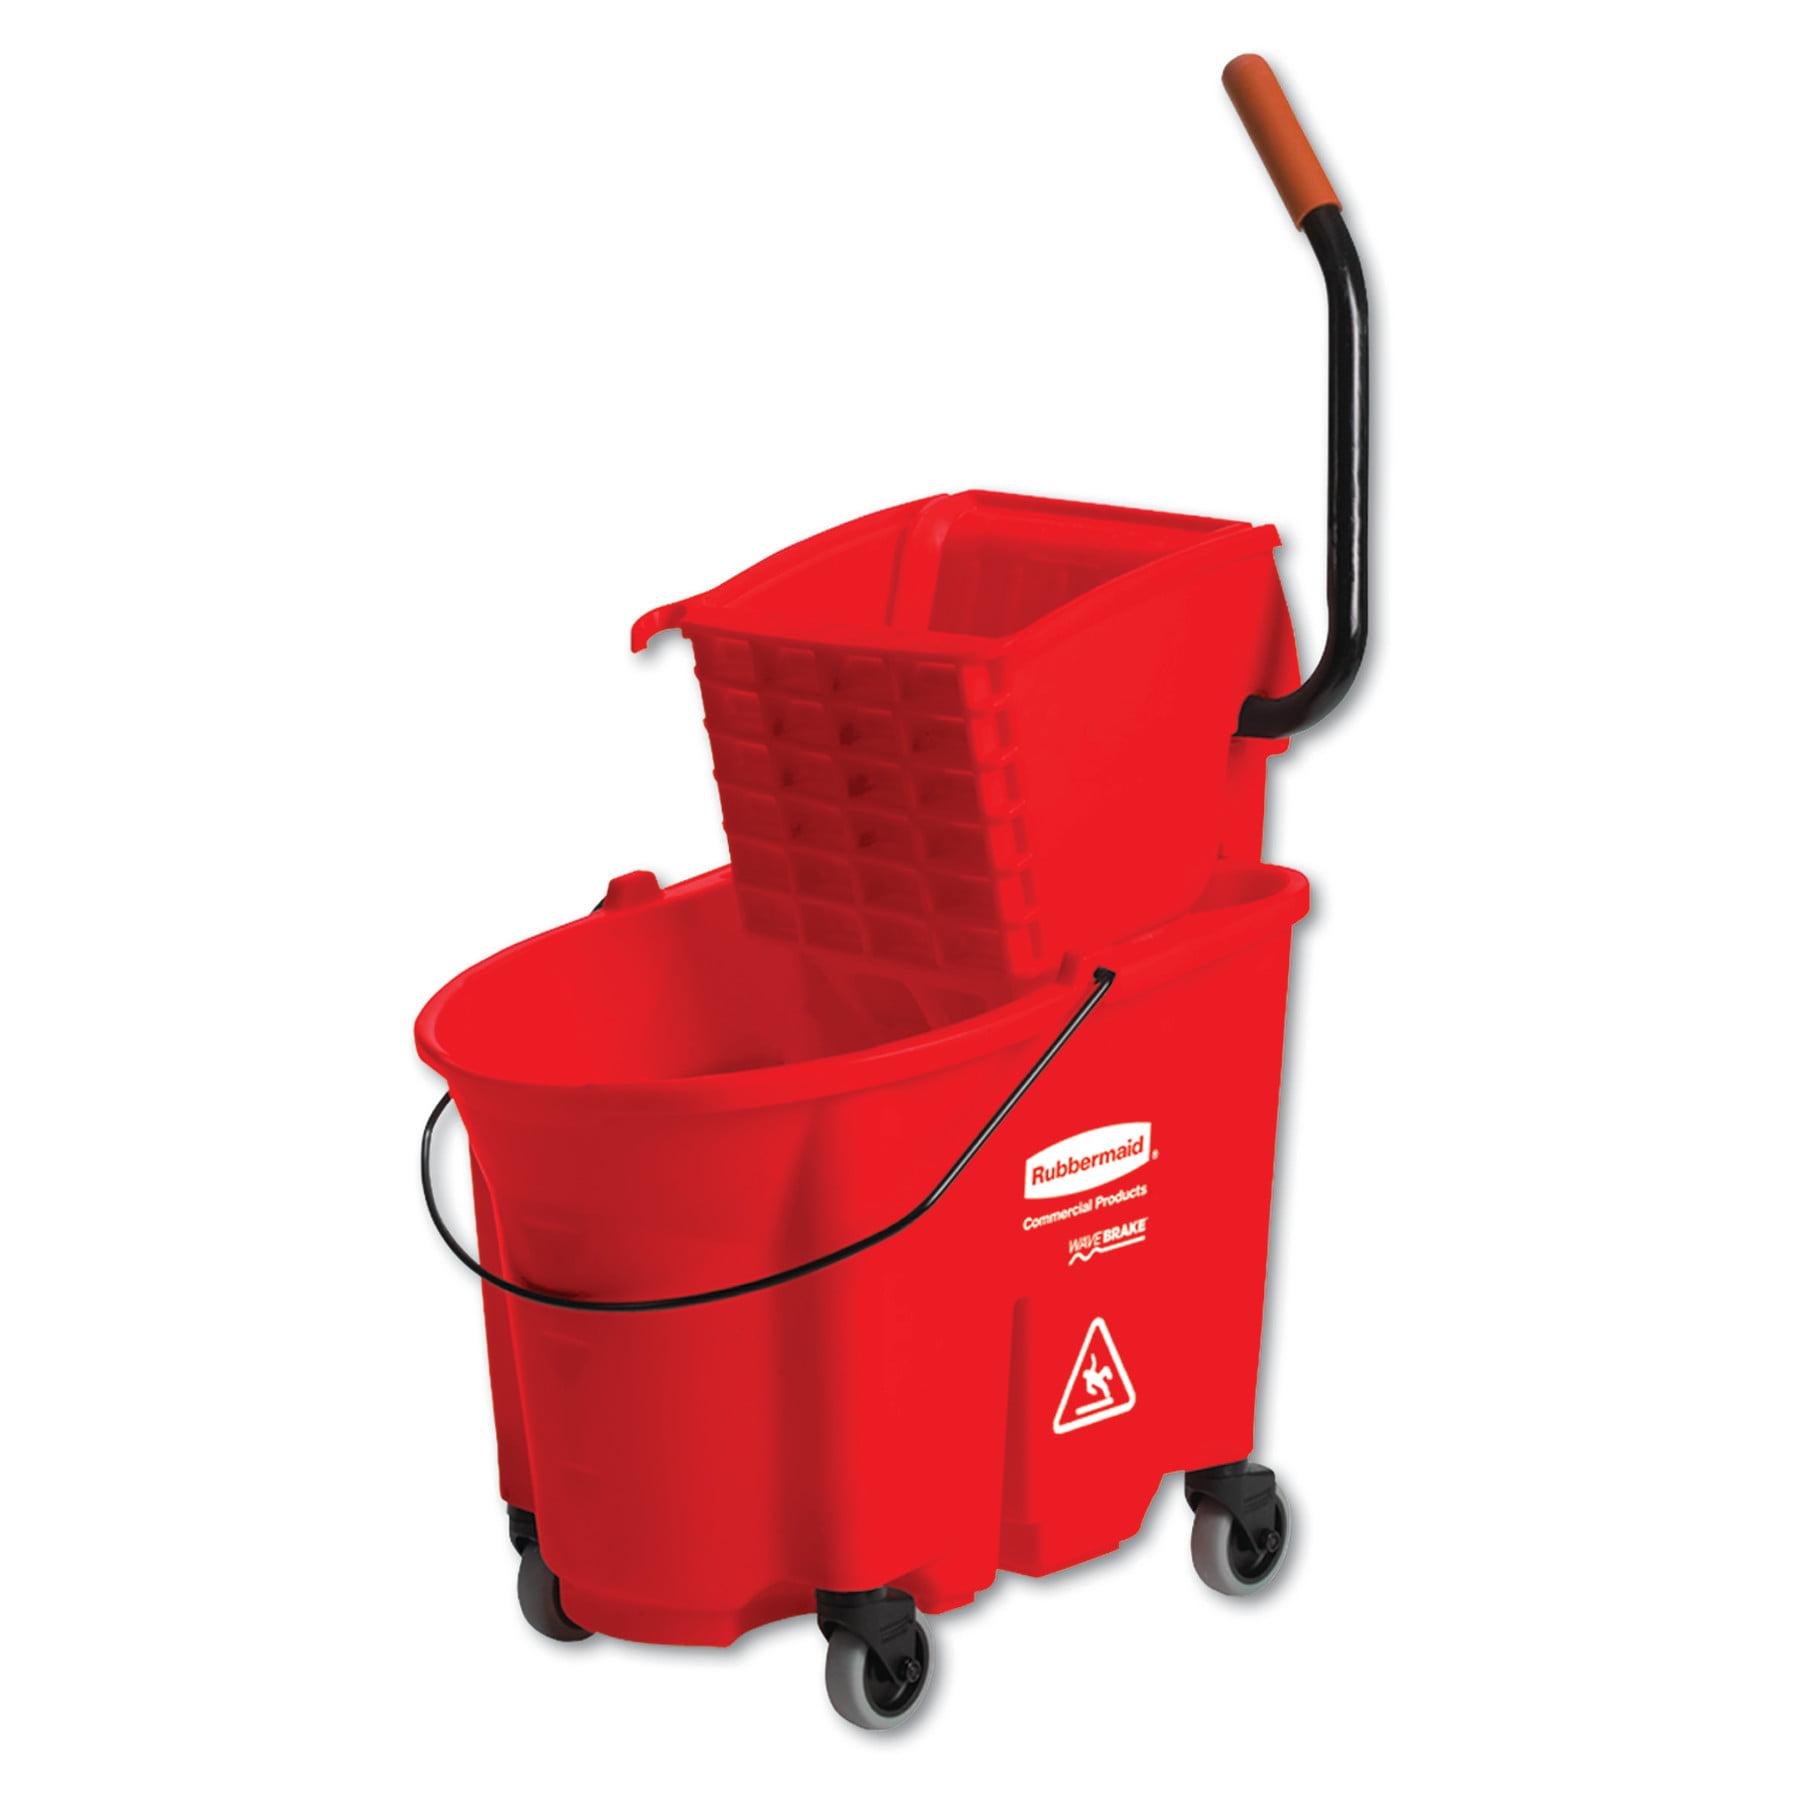 Rubbermaid Commercial WaveBrake Side-Press Wringer/Bucket Combo, 8.75 gal, Red